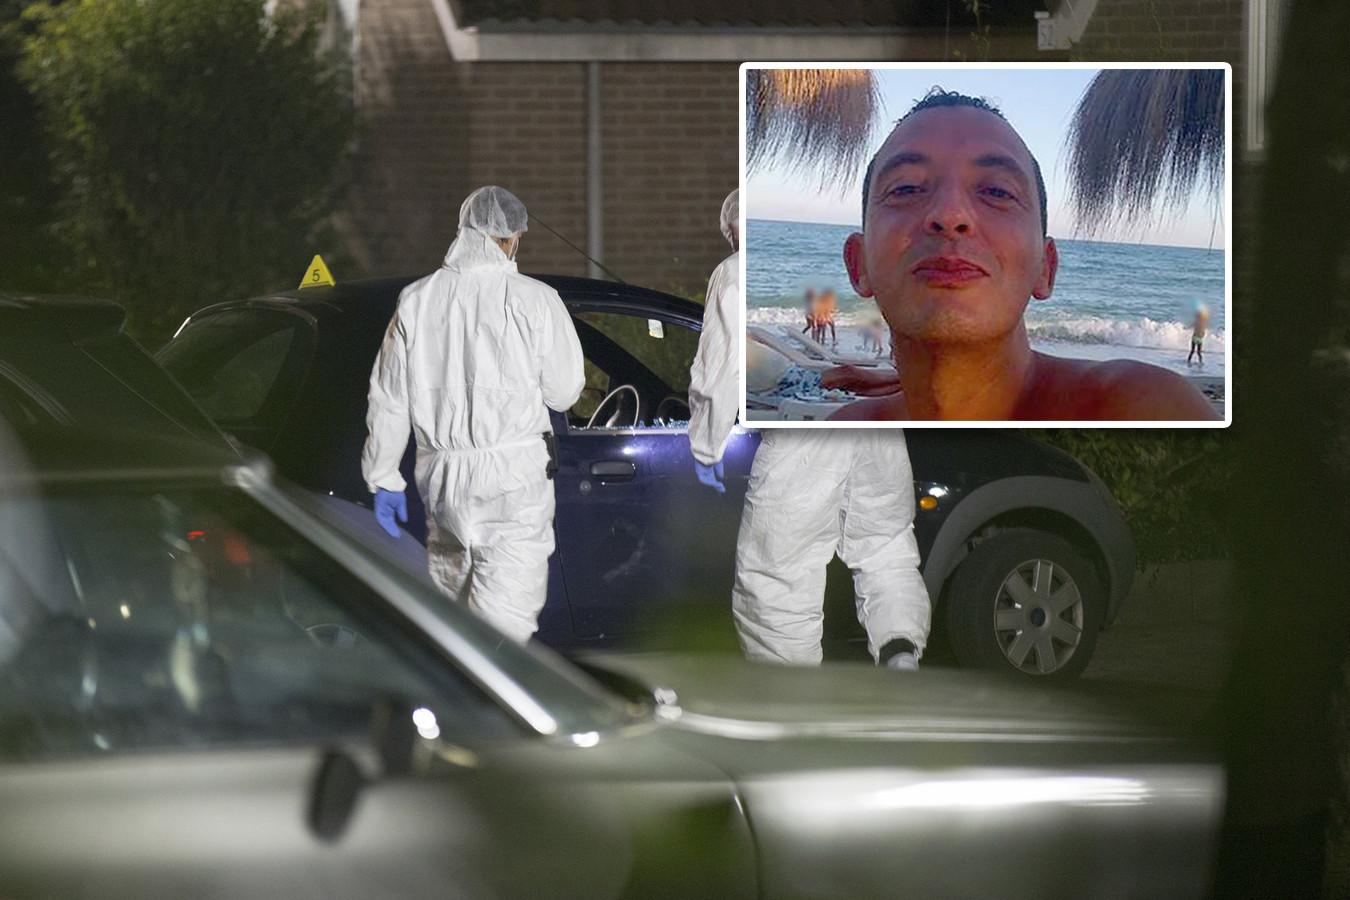 Spyshopmedewerker Ronald Bakker werd in september 2015 in Huizen vermoord. Ridouan Taghi in kader. / AD fotobewerking